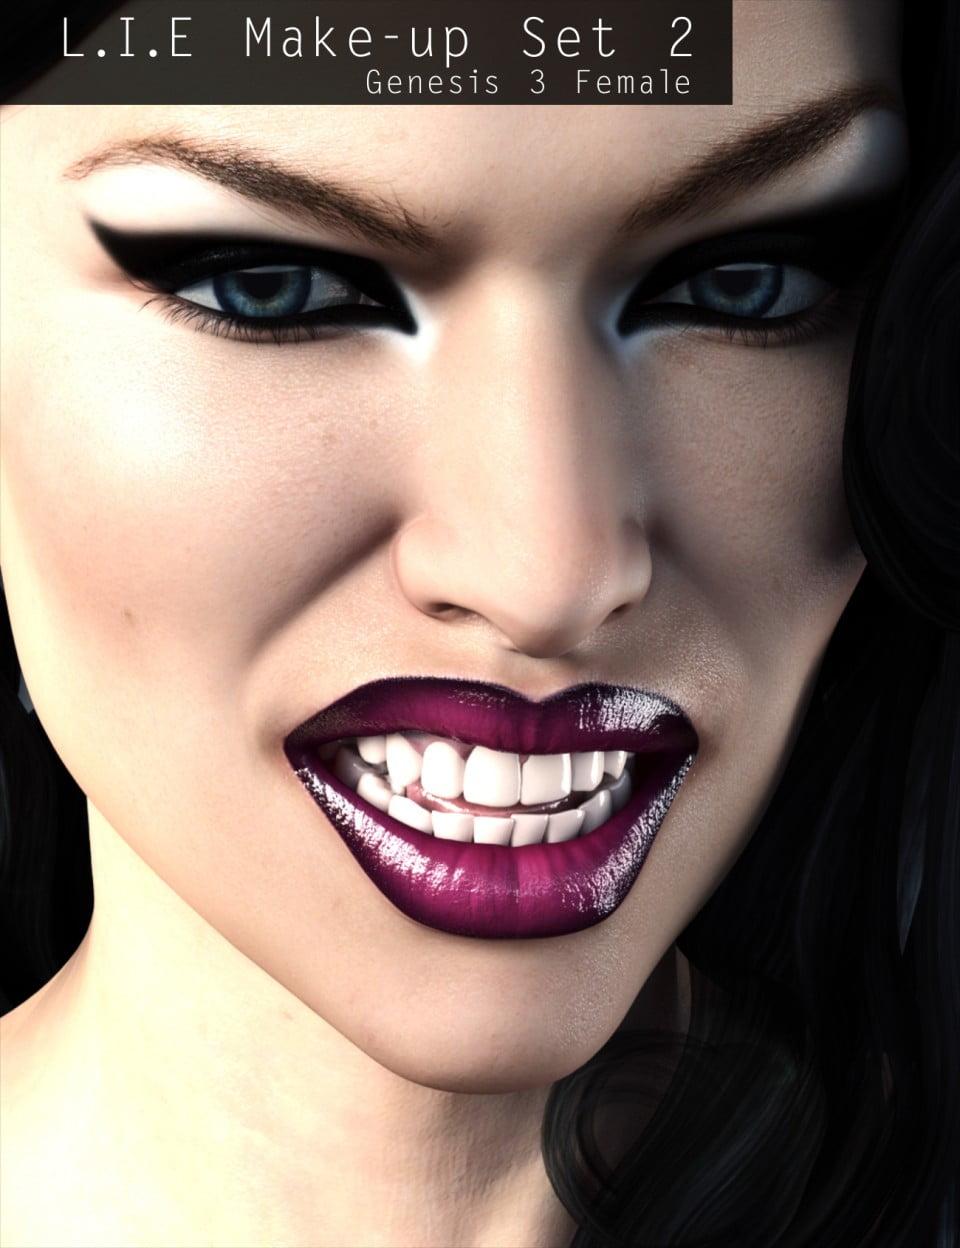 L.I.E Make-up Set 2 for Genesis 3 Female(s)